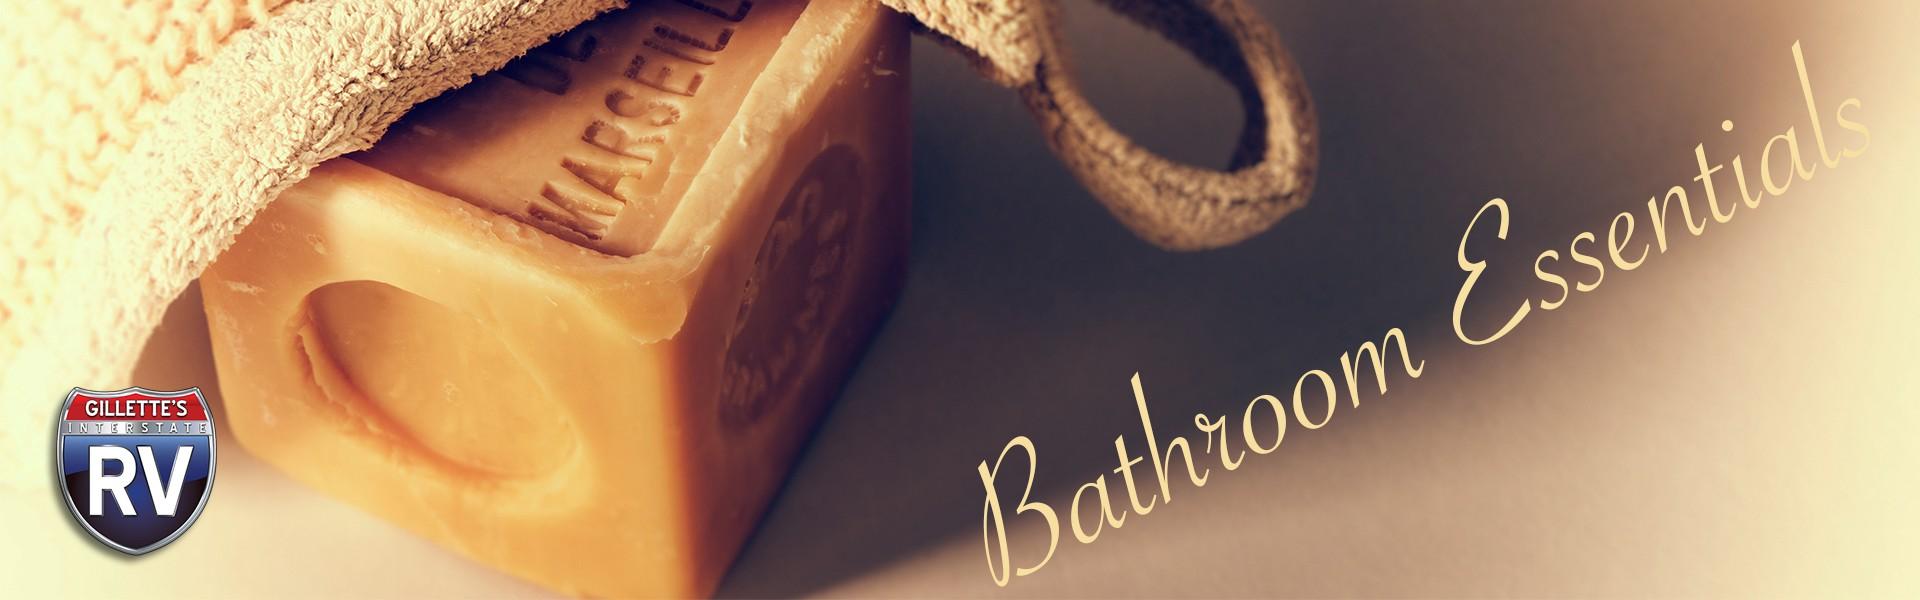 Bathroom essentials - bar of soap and cloth